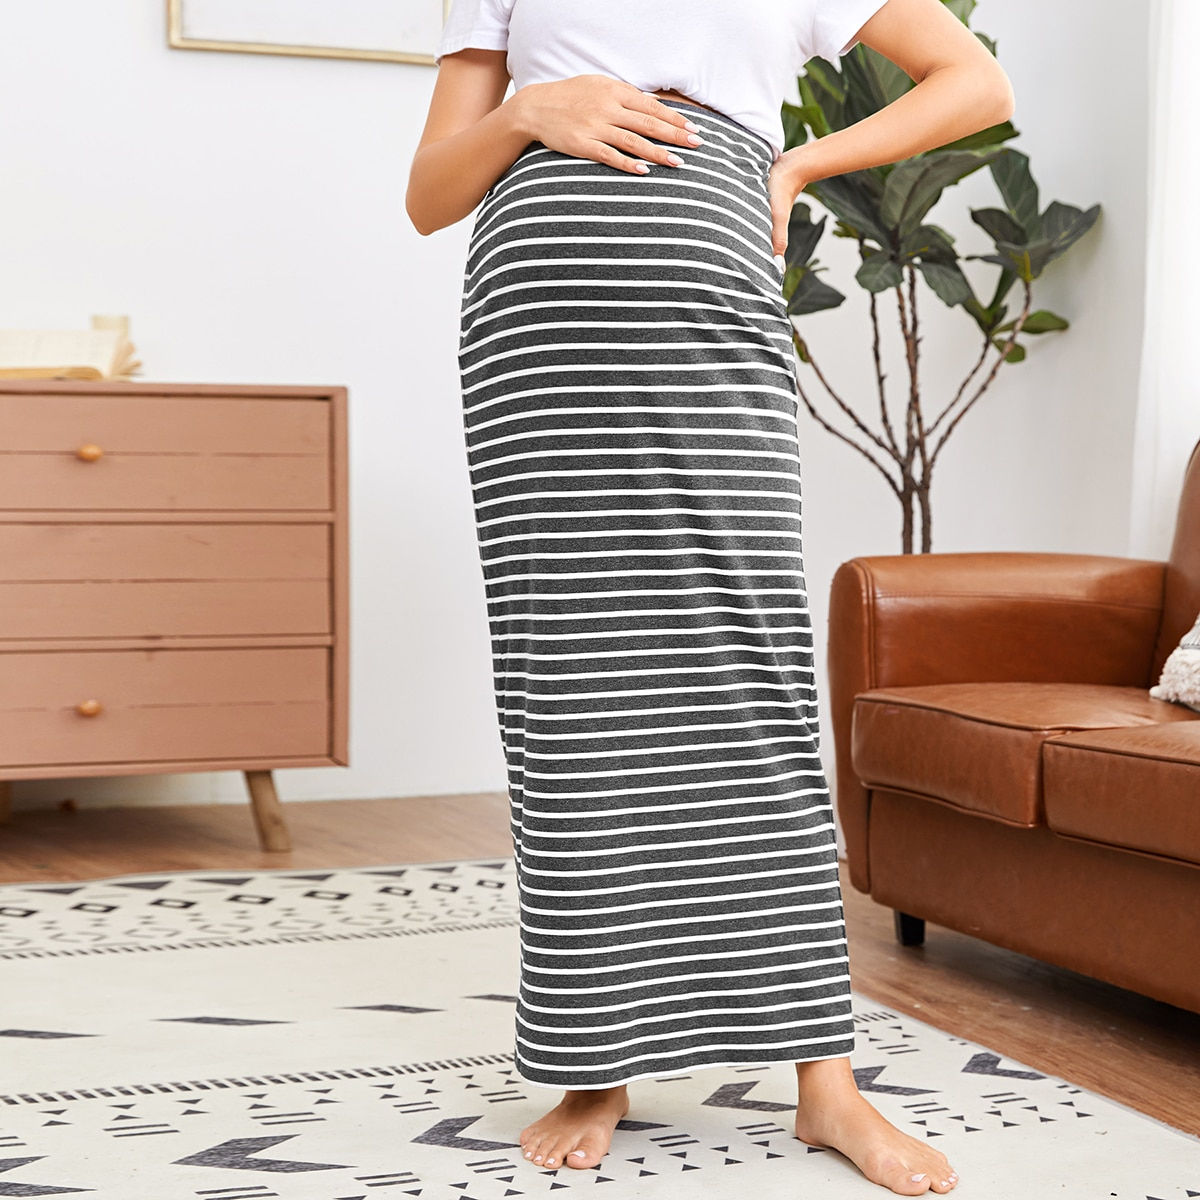 SHEIN / Maternity Maxi Rock mit Streifen